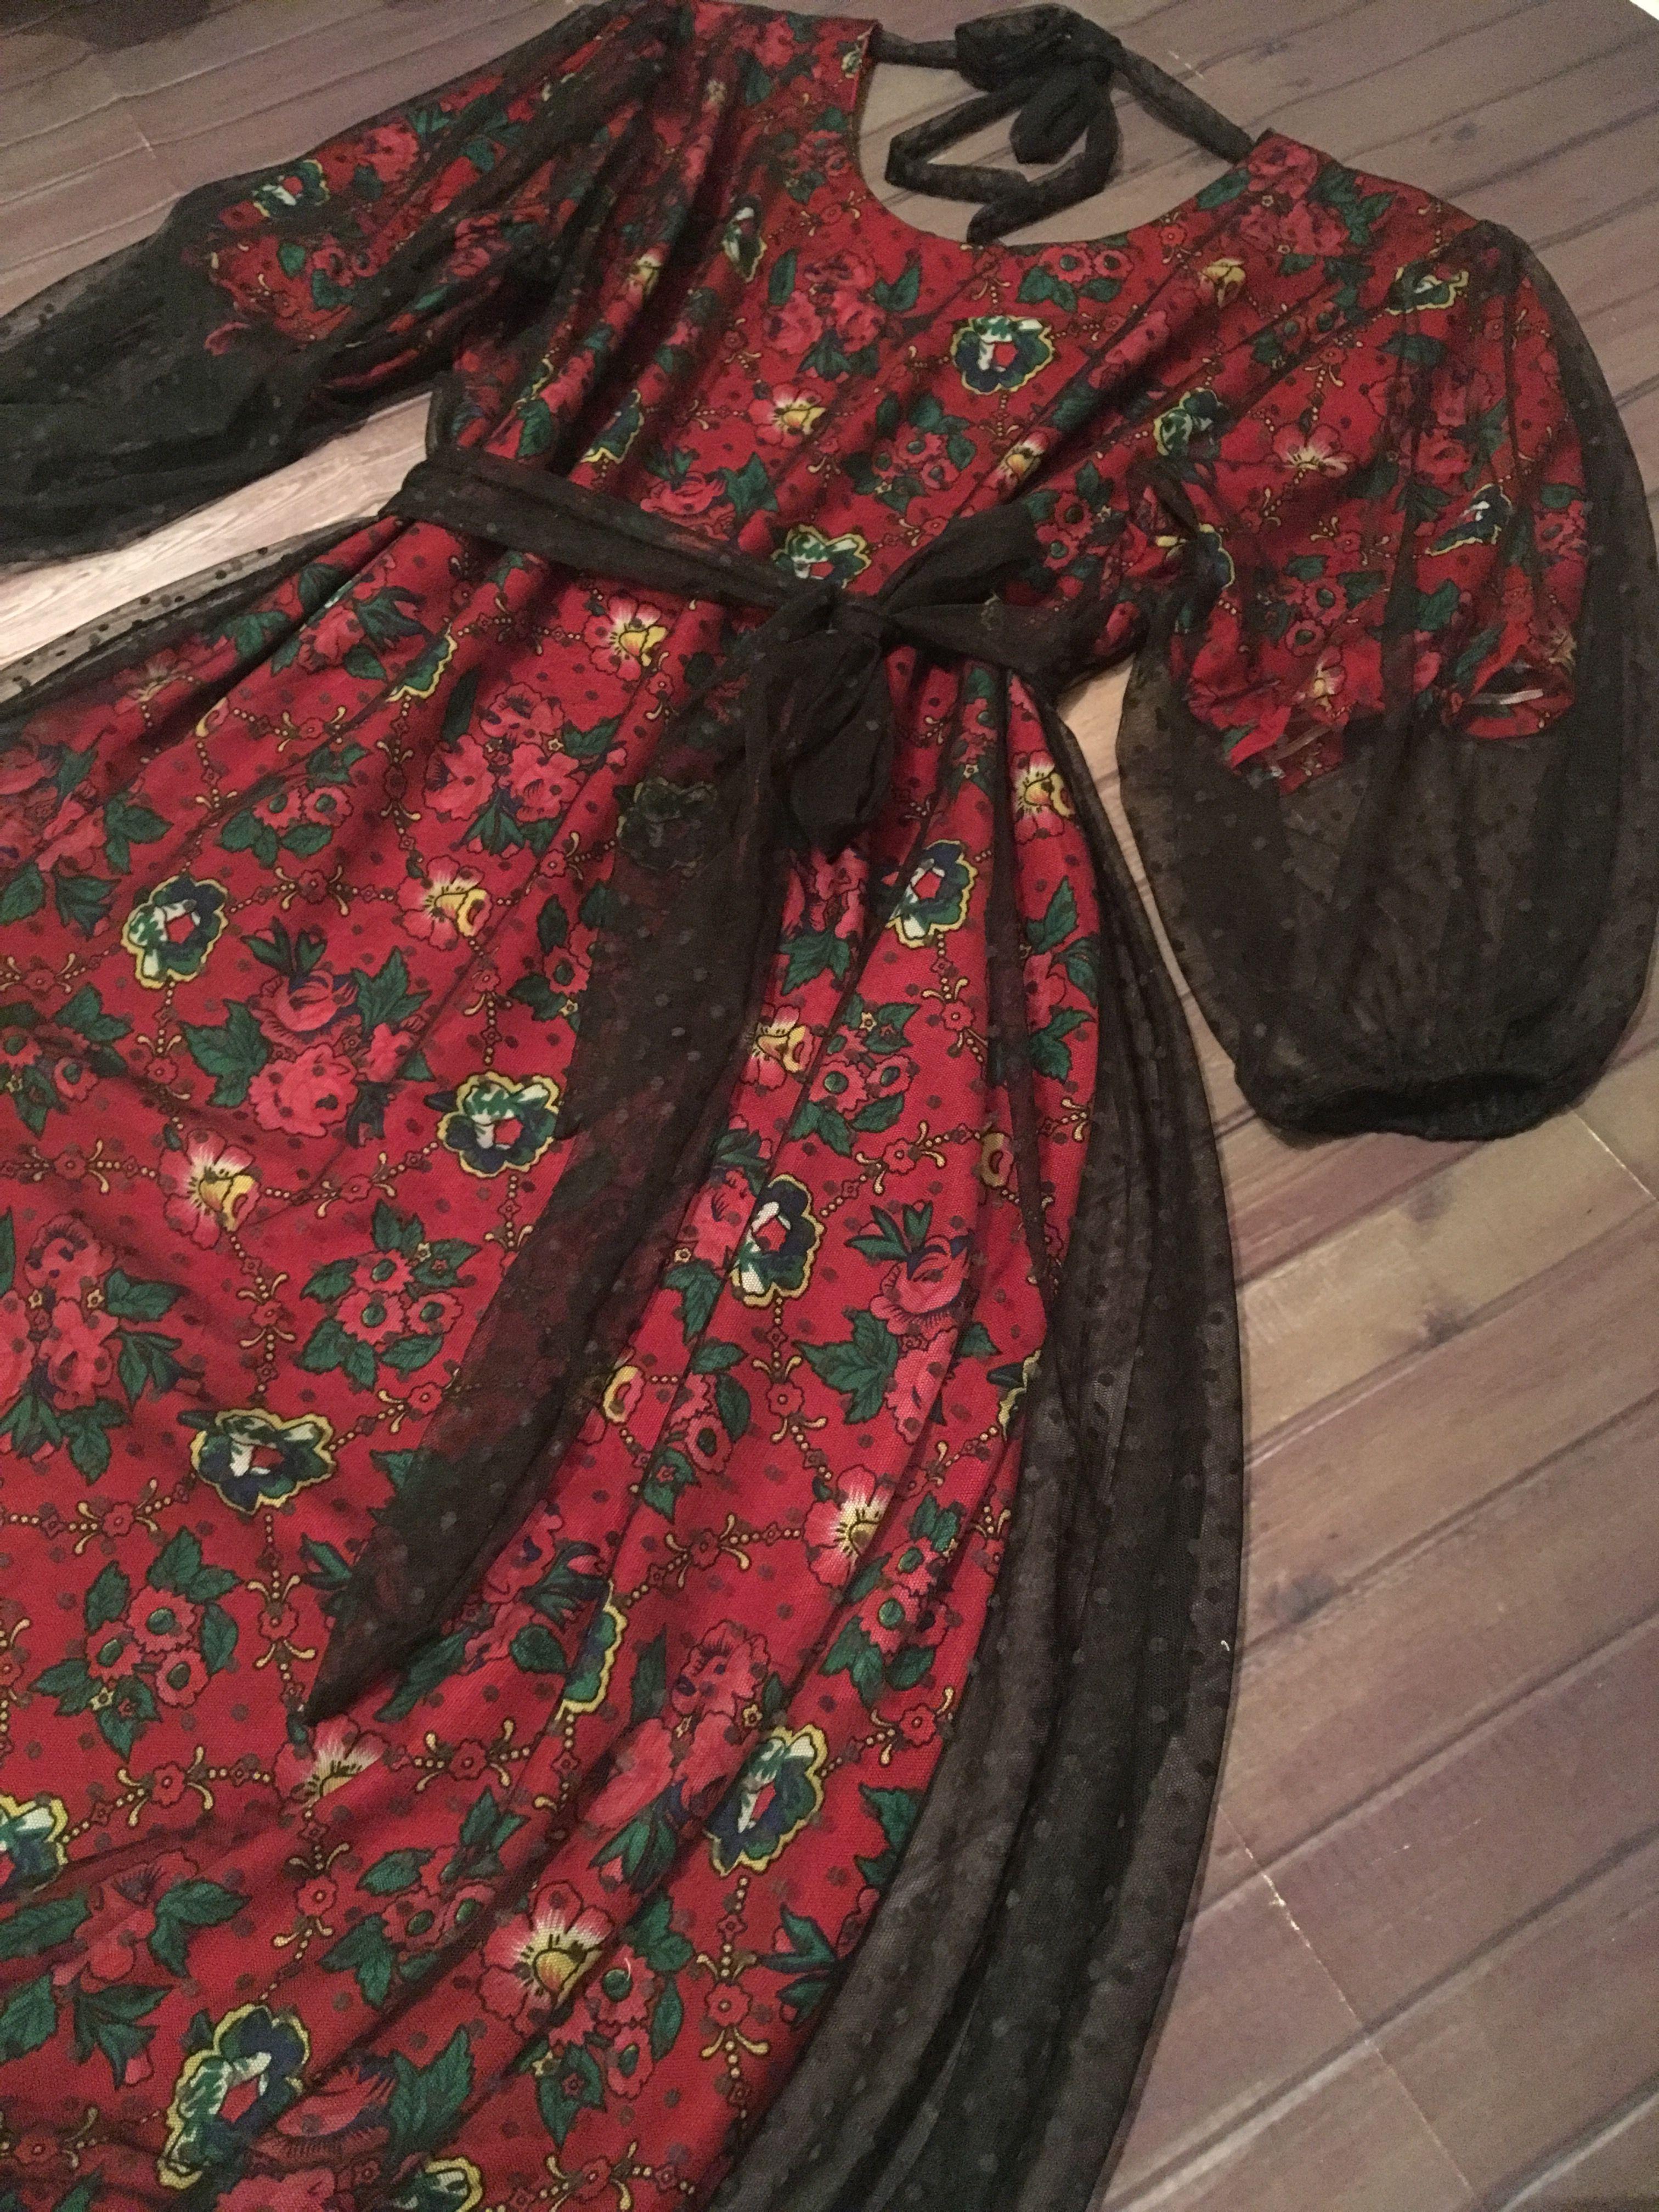 Pin By Manayer Alattawi On جلابيات Fashion Dresses Stylish Party Dresses Abayas Fashion